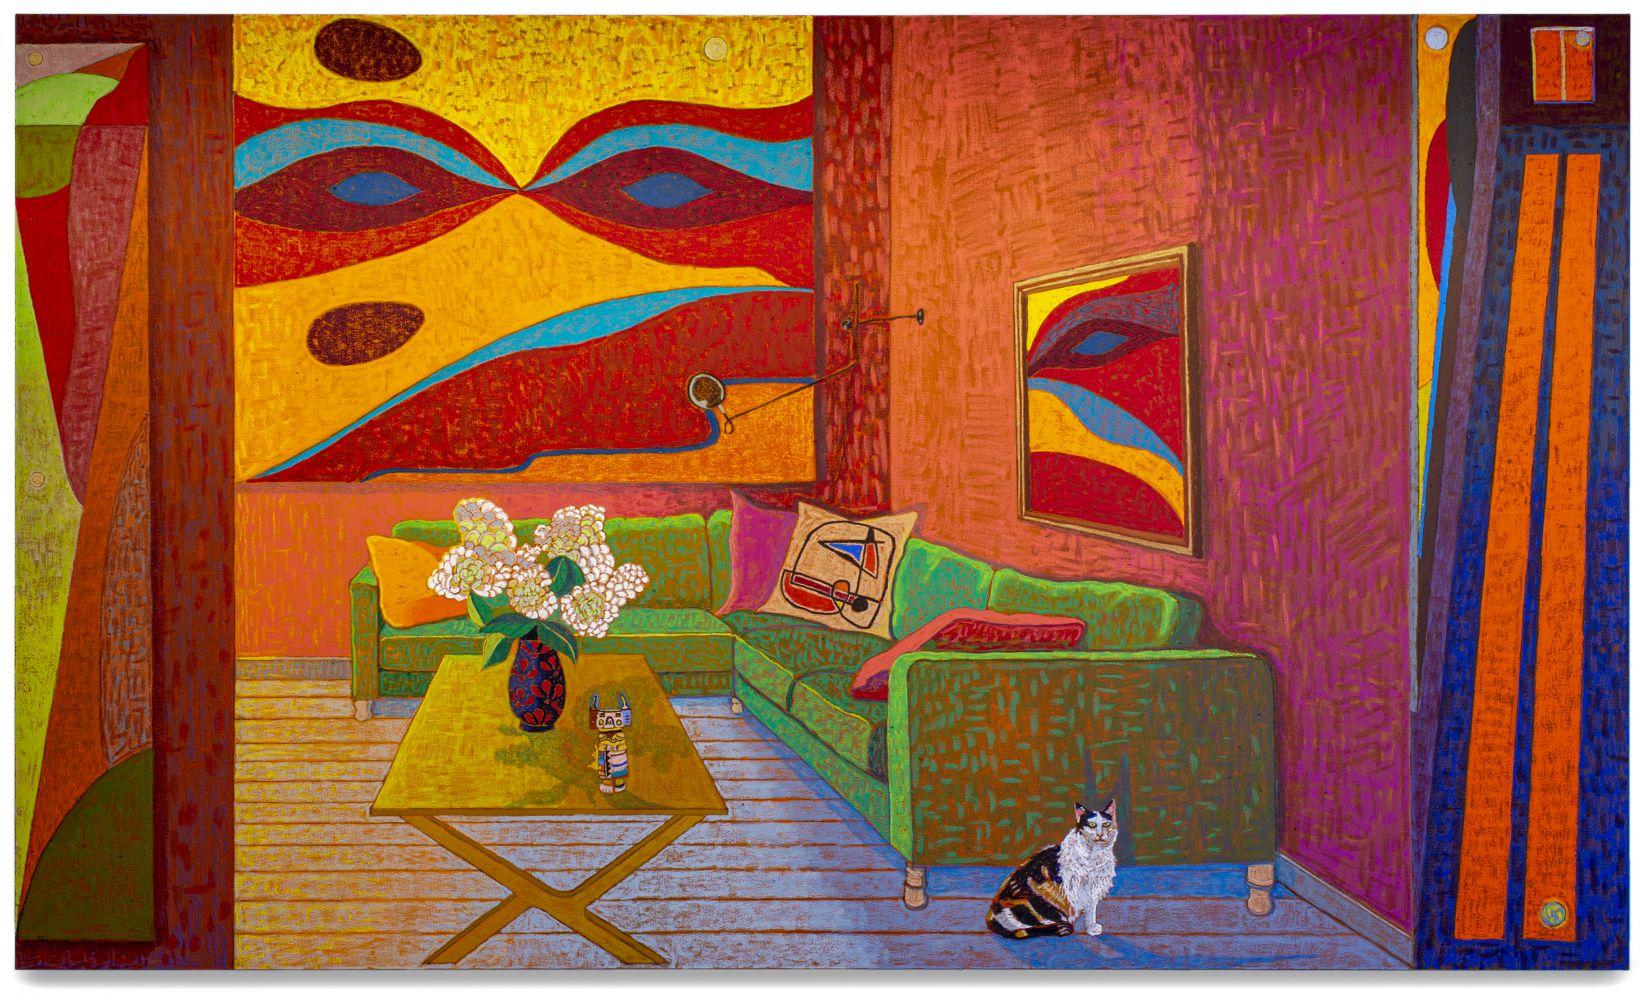 JJ Manford, New American Painting, 2021